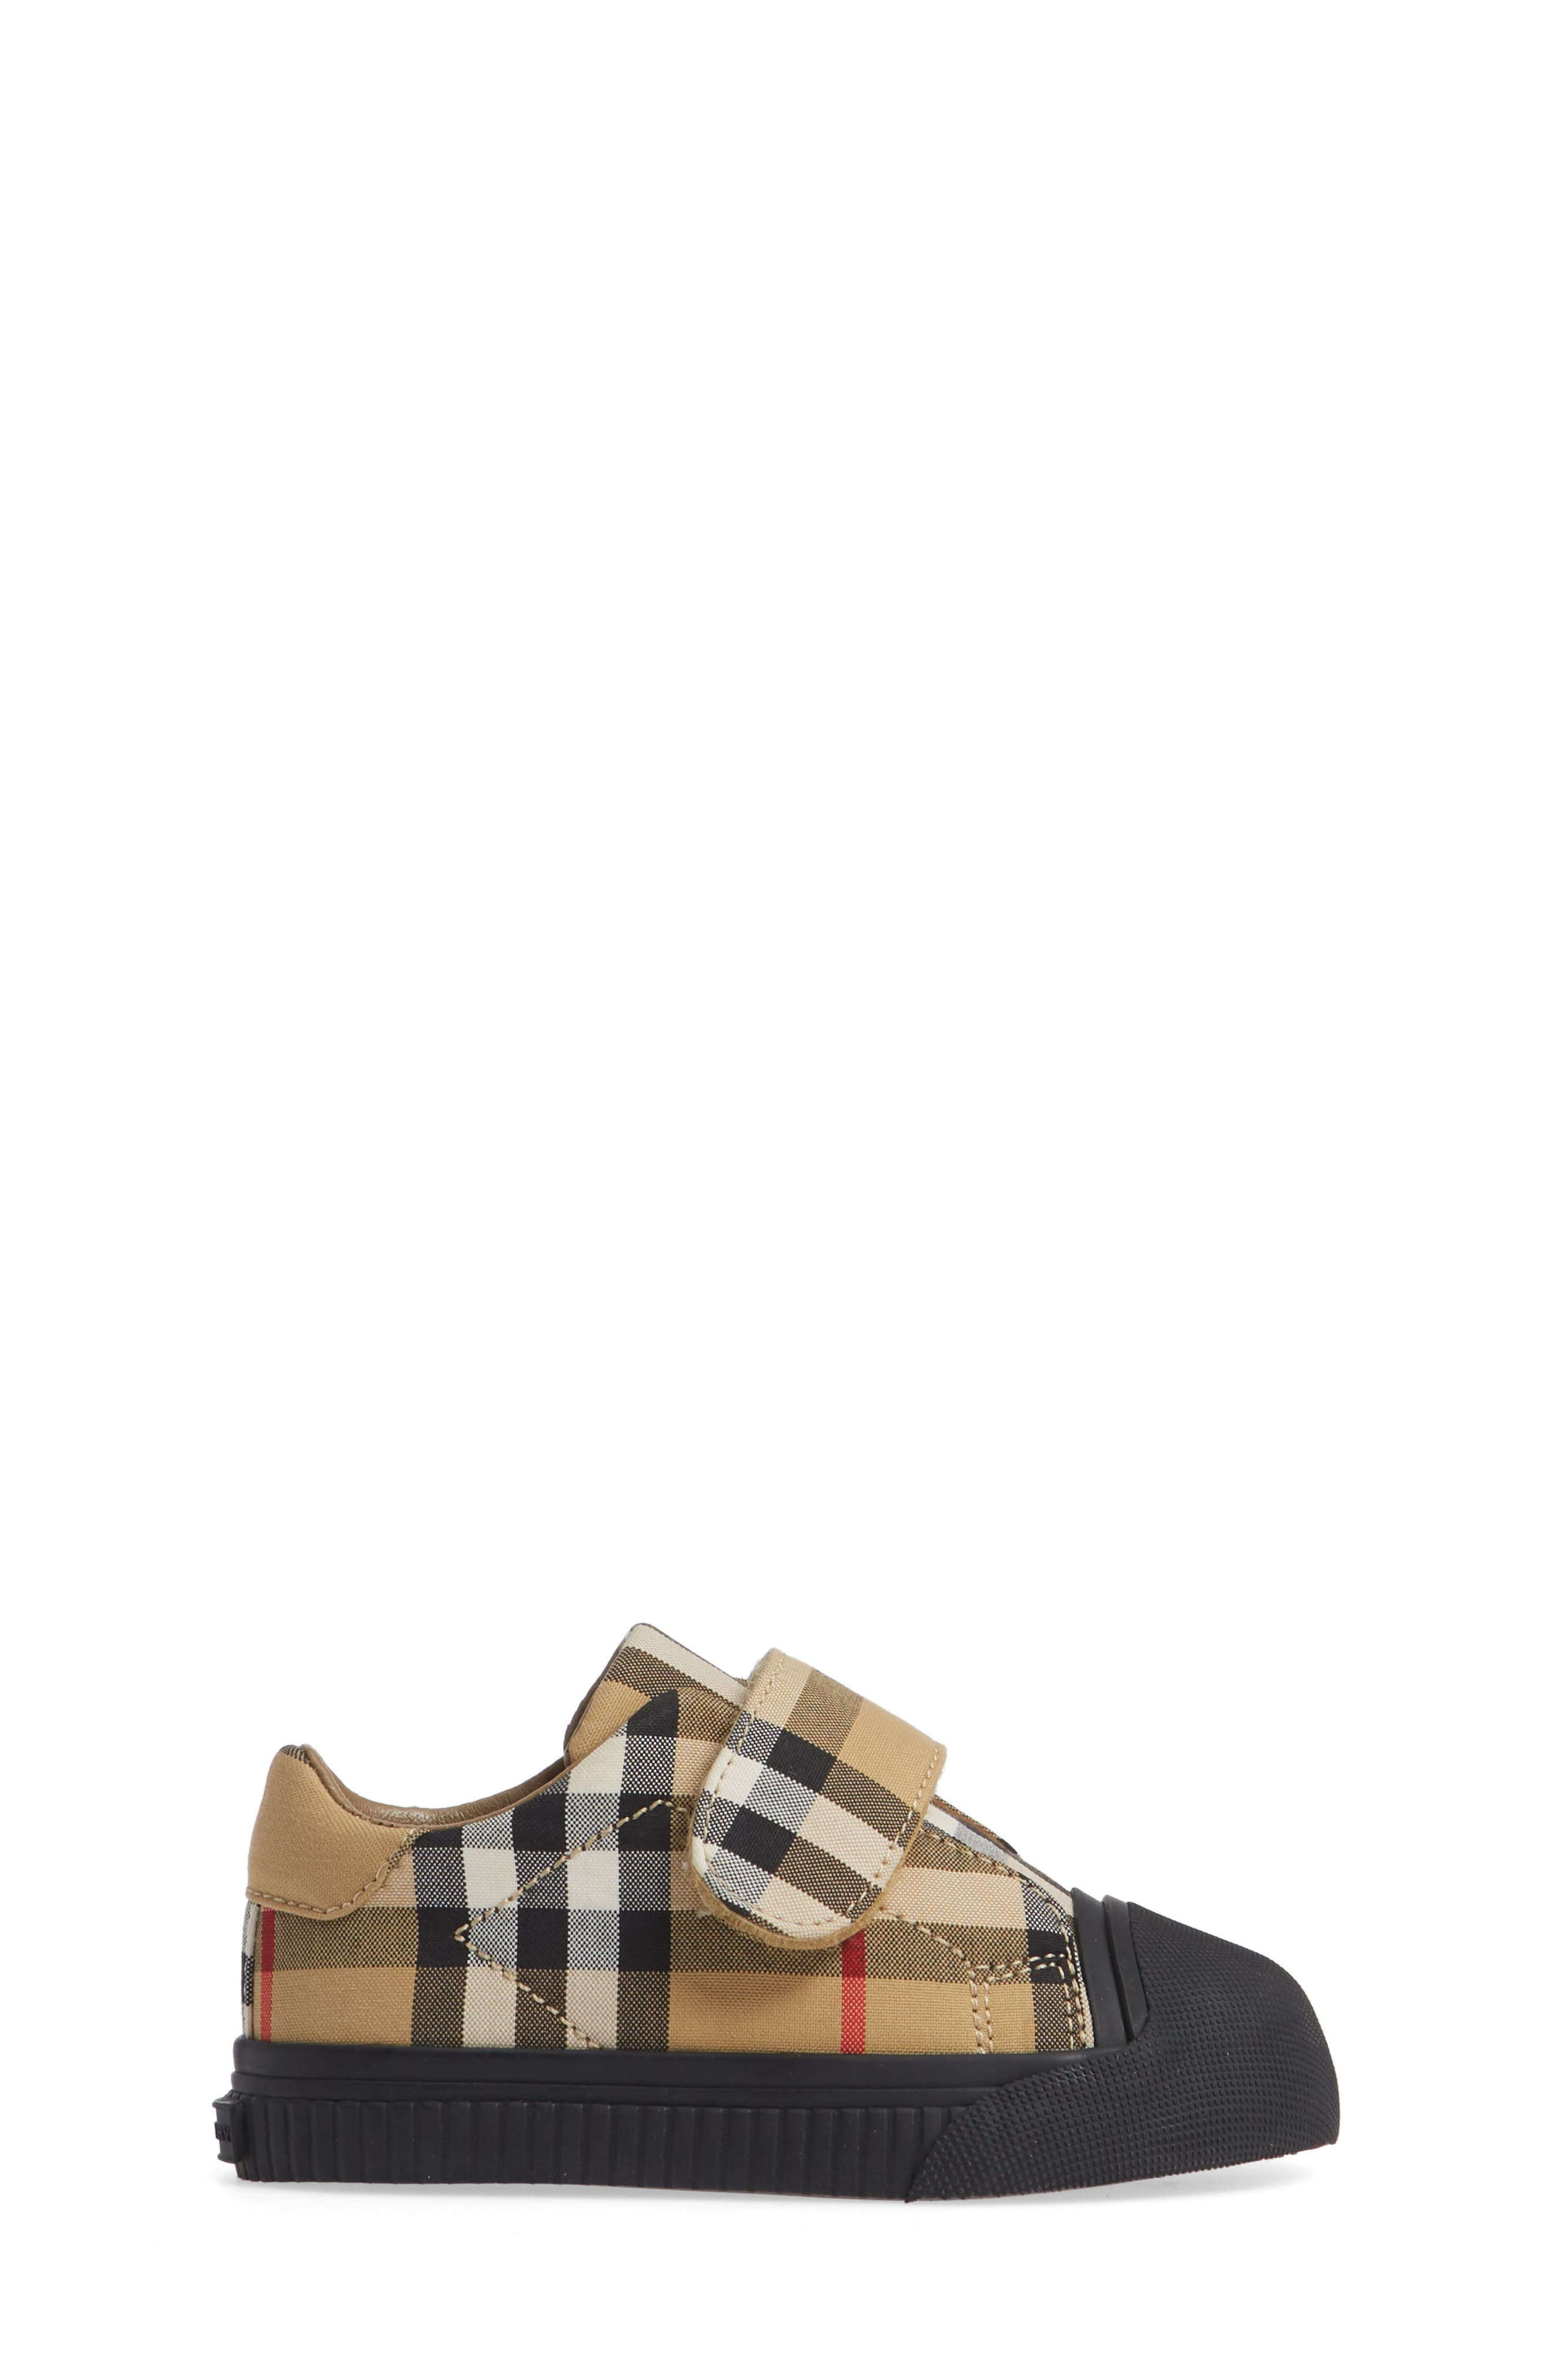 Beech Check Sneaker,                             Alternate thumbnail 3, color,                             001